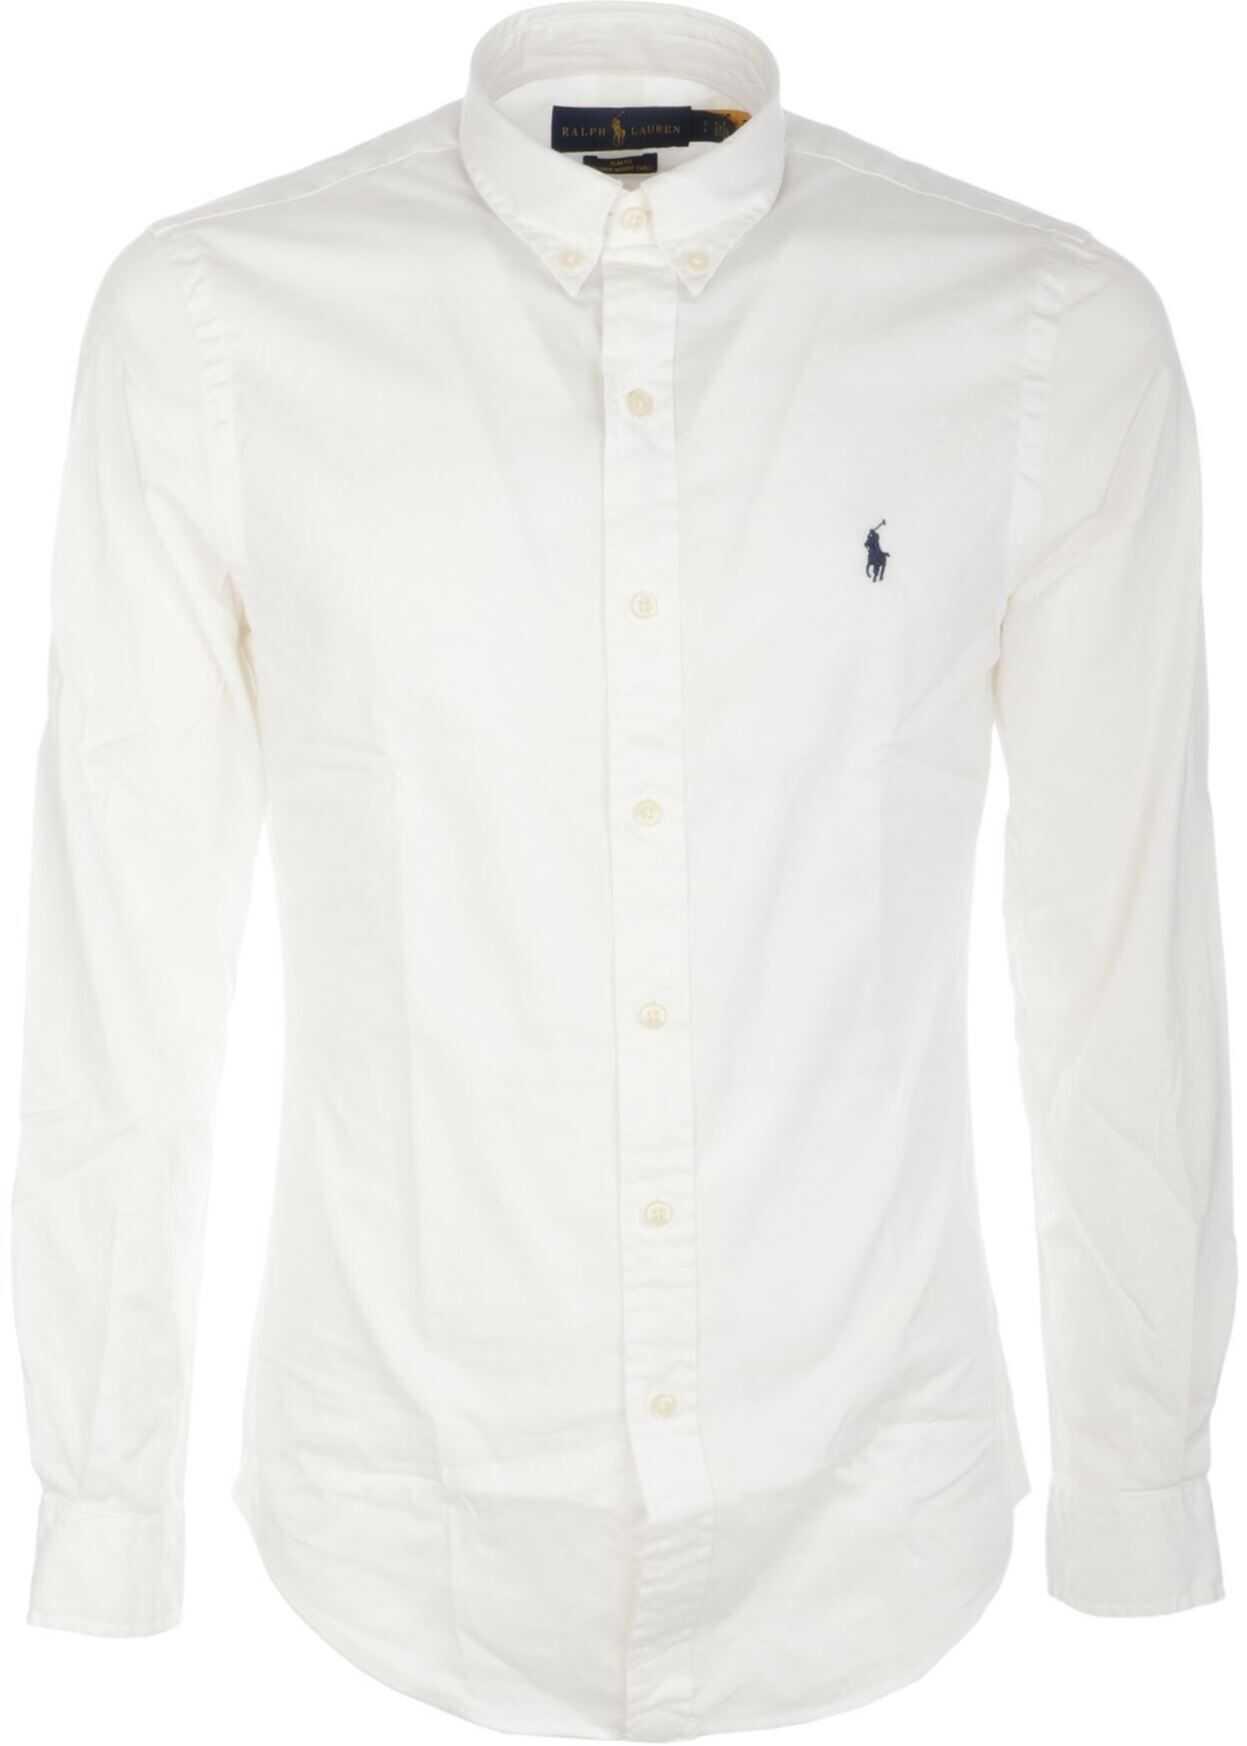 Ralph Lauren Button Down Shirt In White White imagine